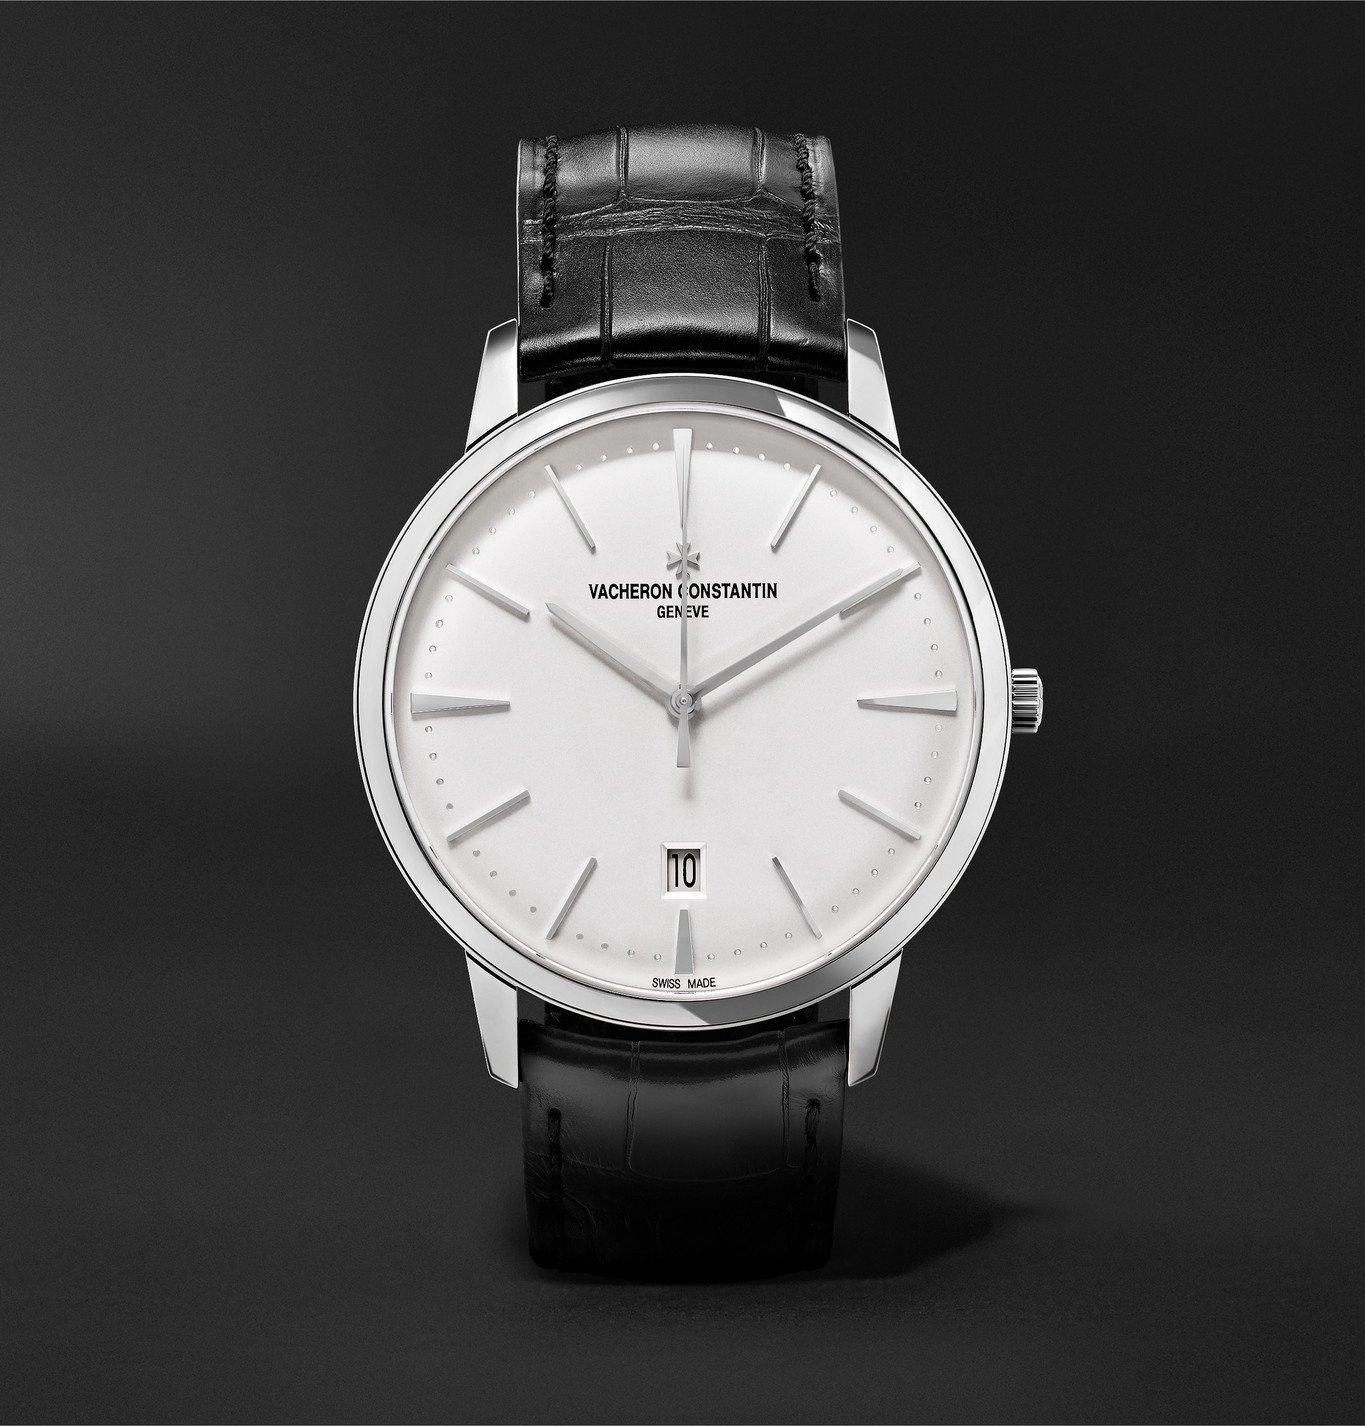 Photo: Vacheron Constantin - Patrimony Automatic 40mm 18-Karat White Gold and Alligator Watch, Ref. No. 85180/000G-9230 - Silver